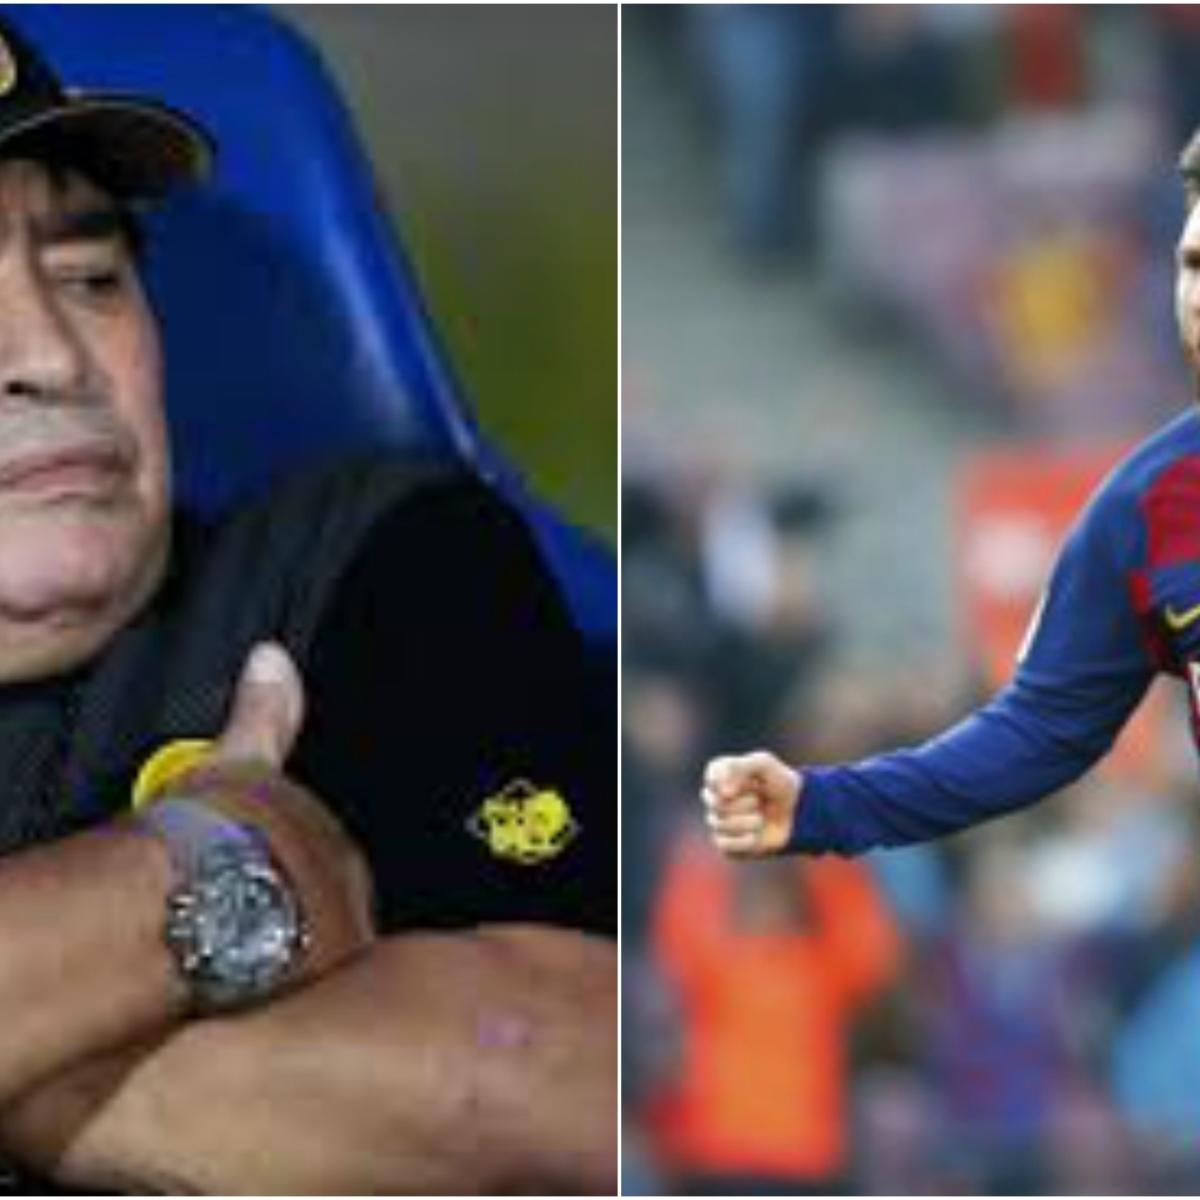 Napoli coach Gattuso says Messi greatest ahead of Maradona